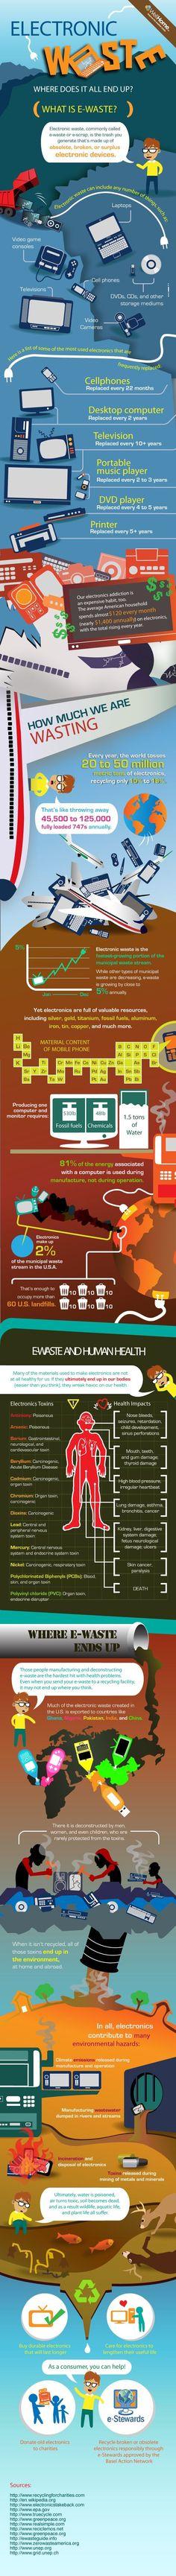 What is ewaste? This picture helps define that. #Limitewaste #technologypollution